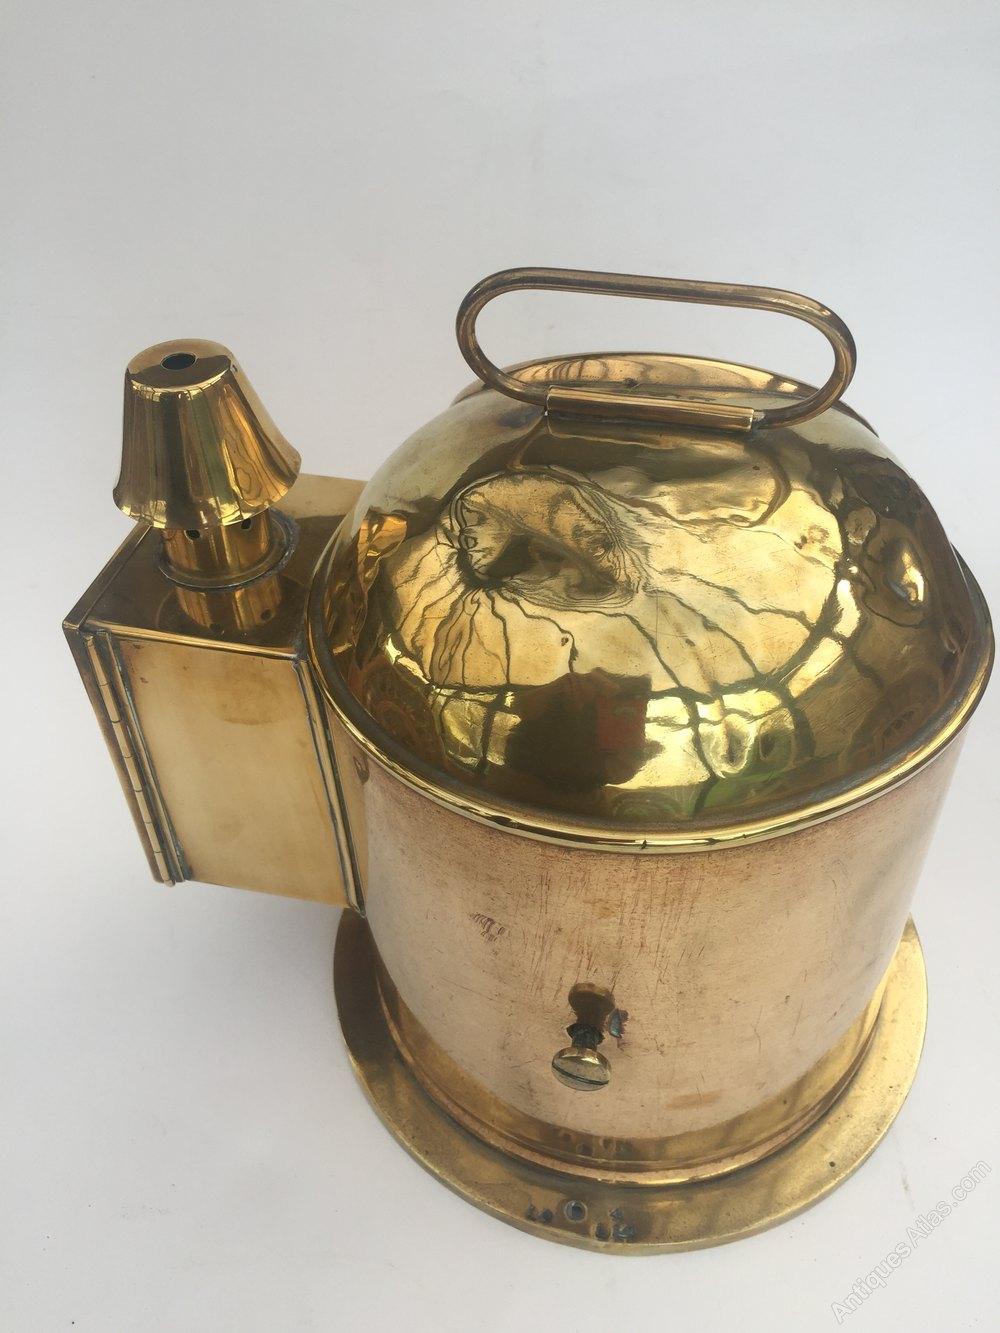 Antiques Atlas - Nautical Antique Brass Binnacle Compass